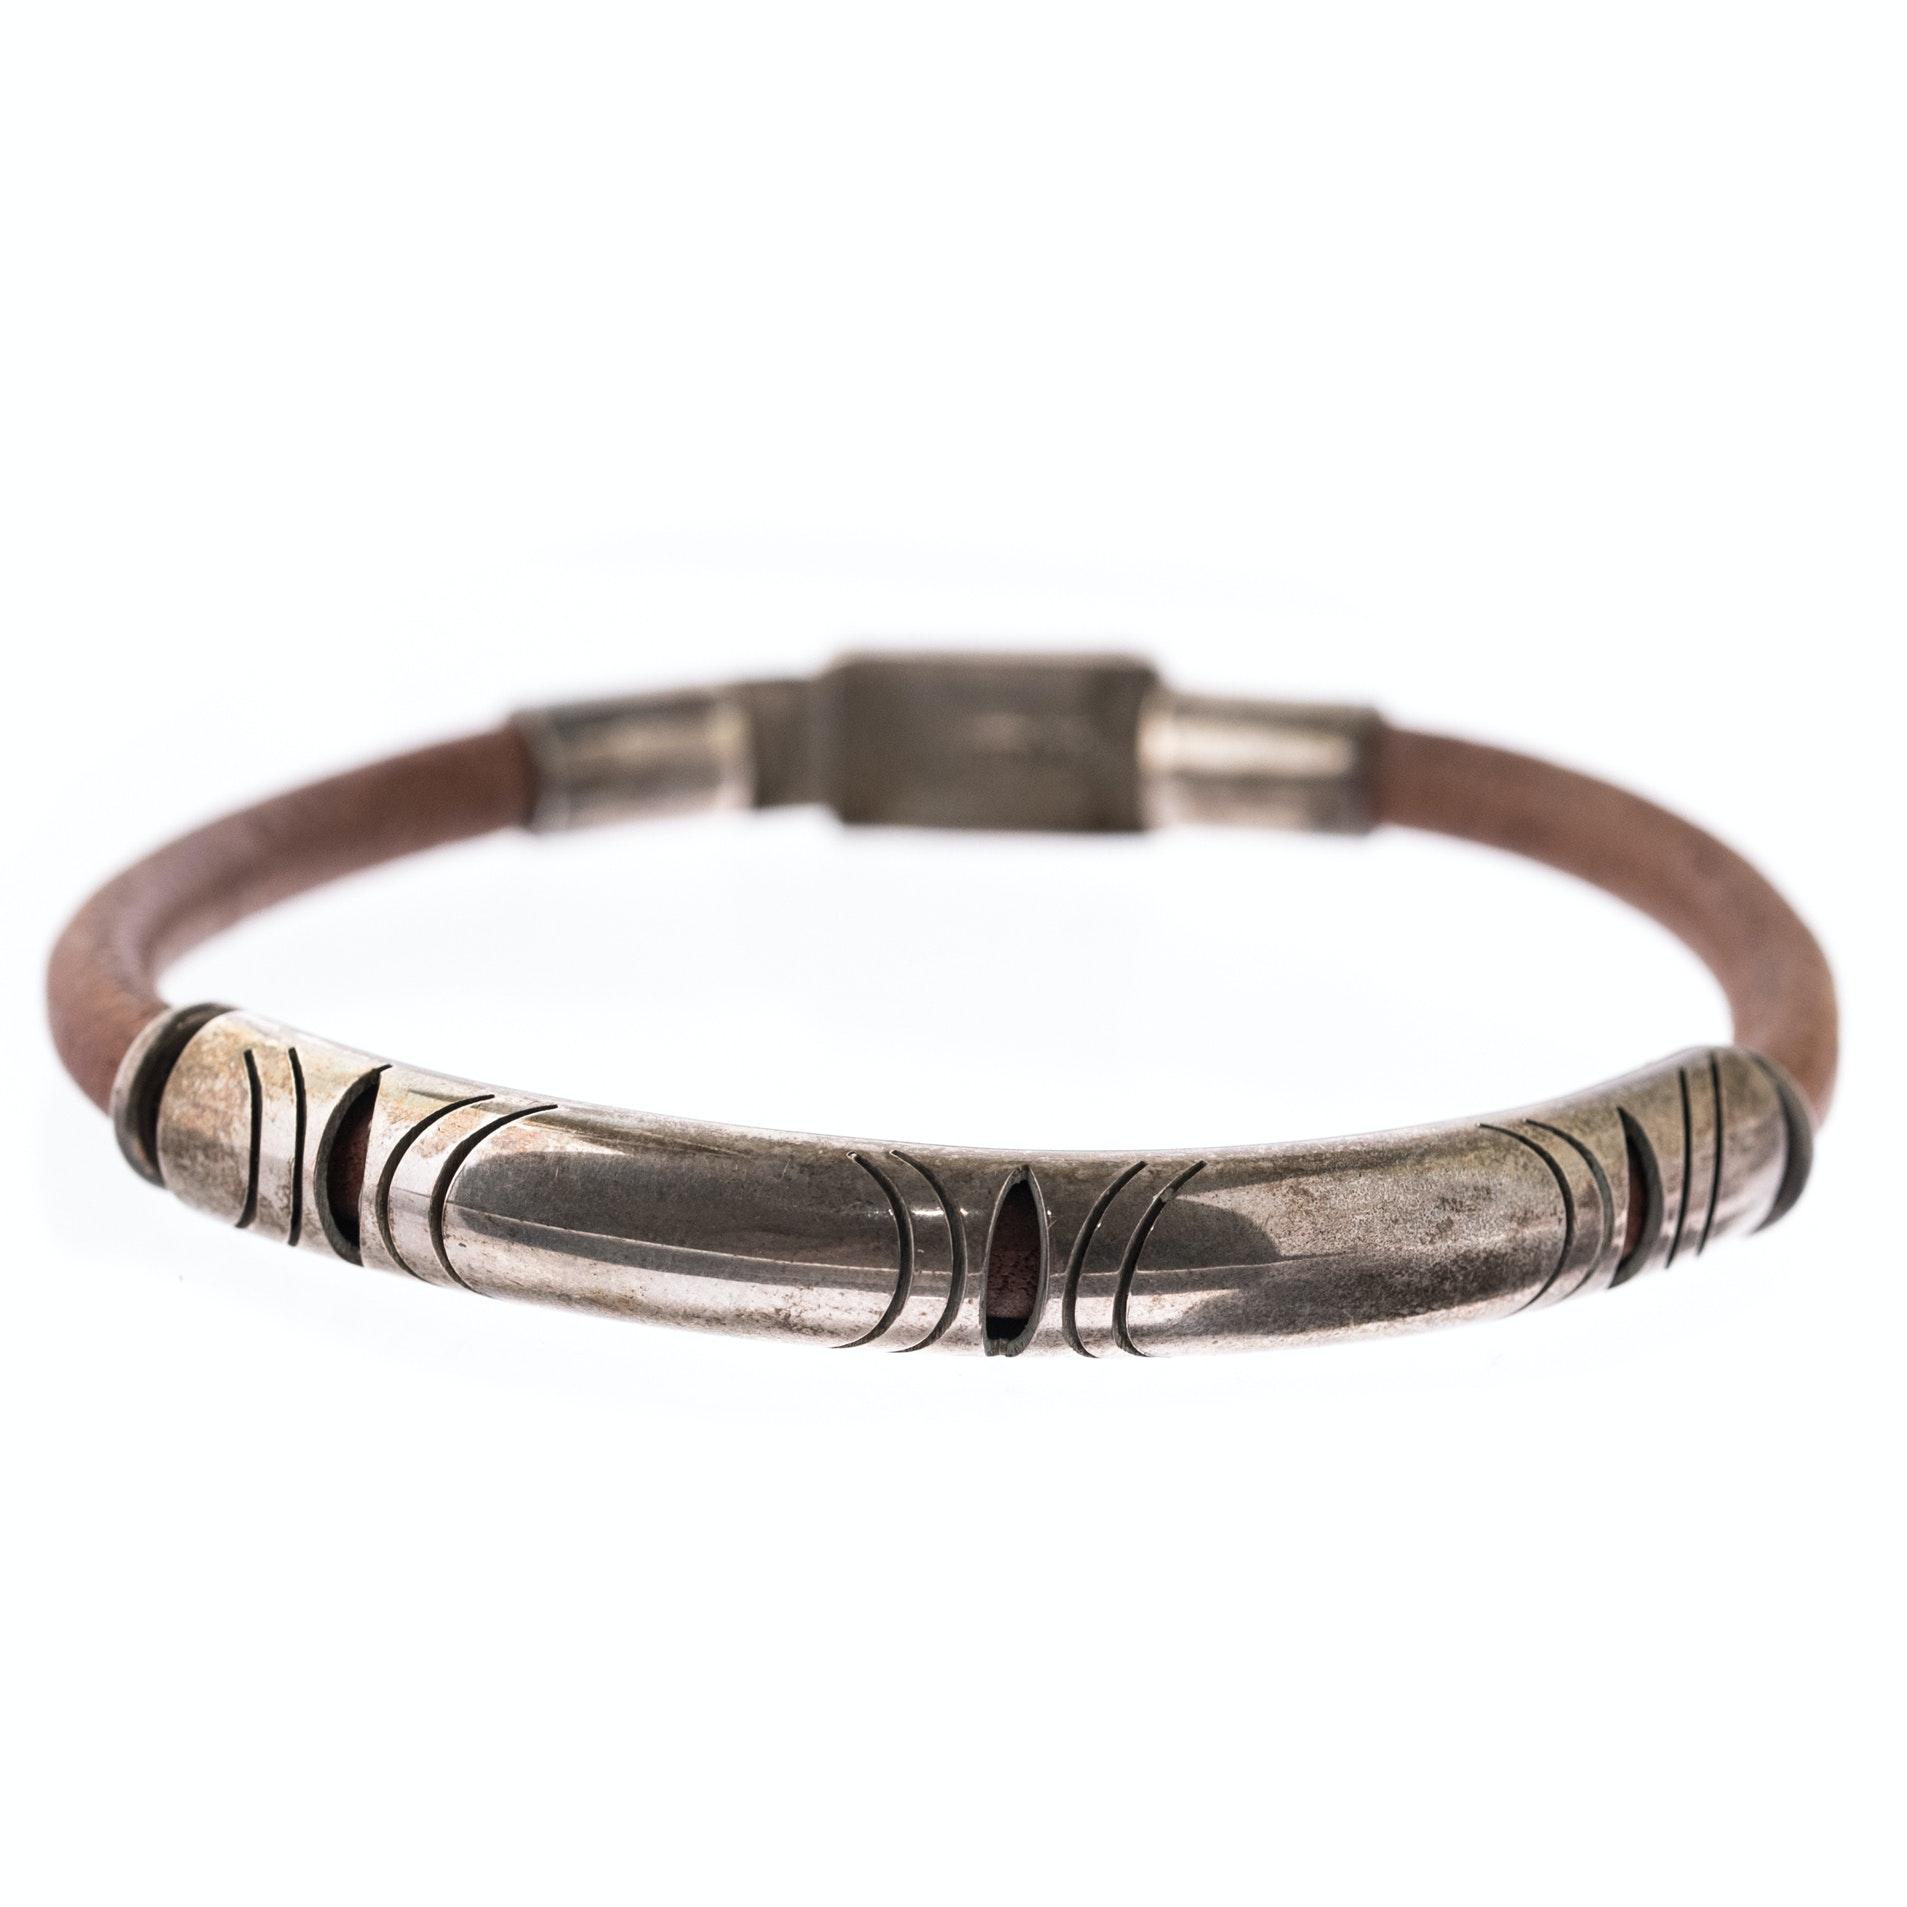 Sterling Silver and Caramel Color Leather Bracelet